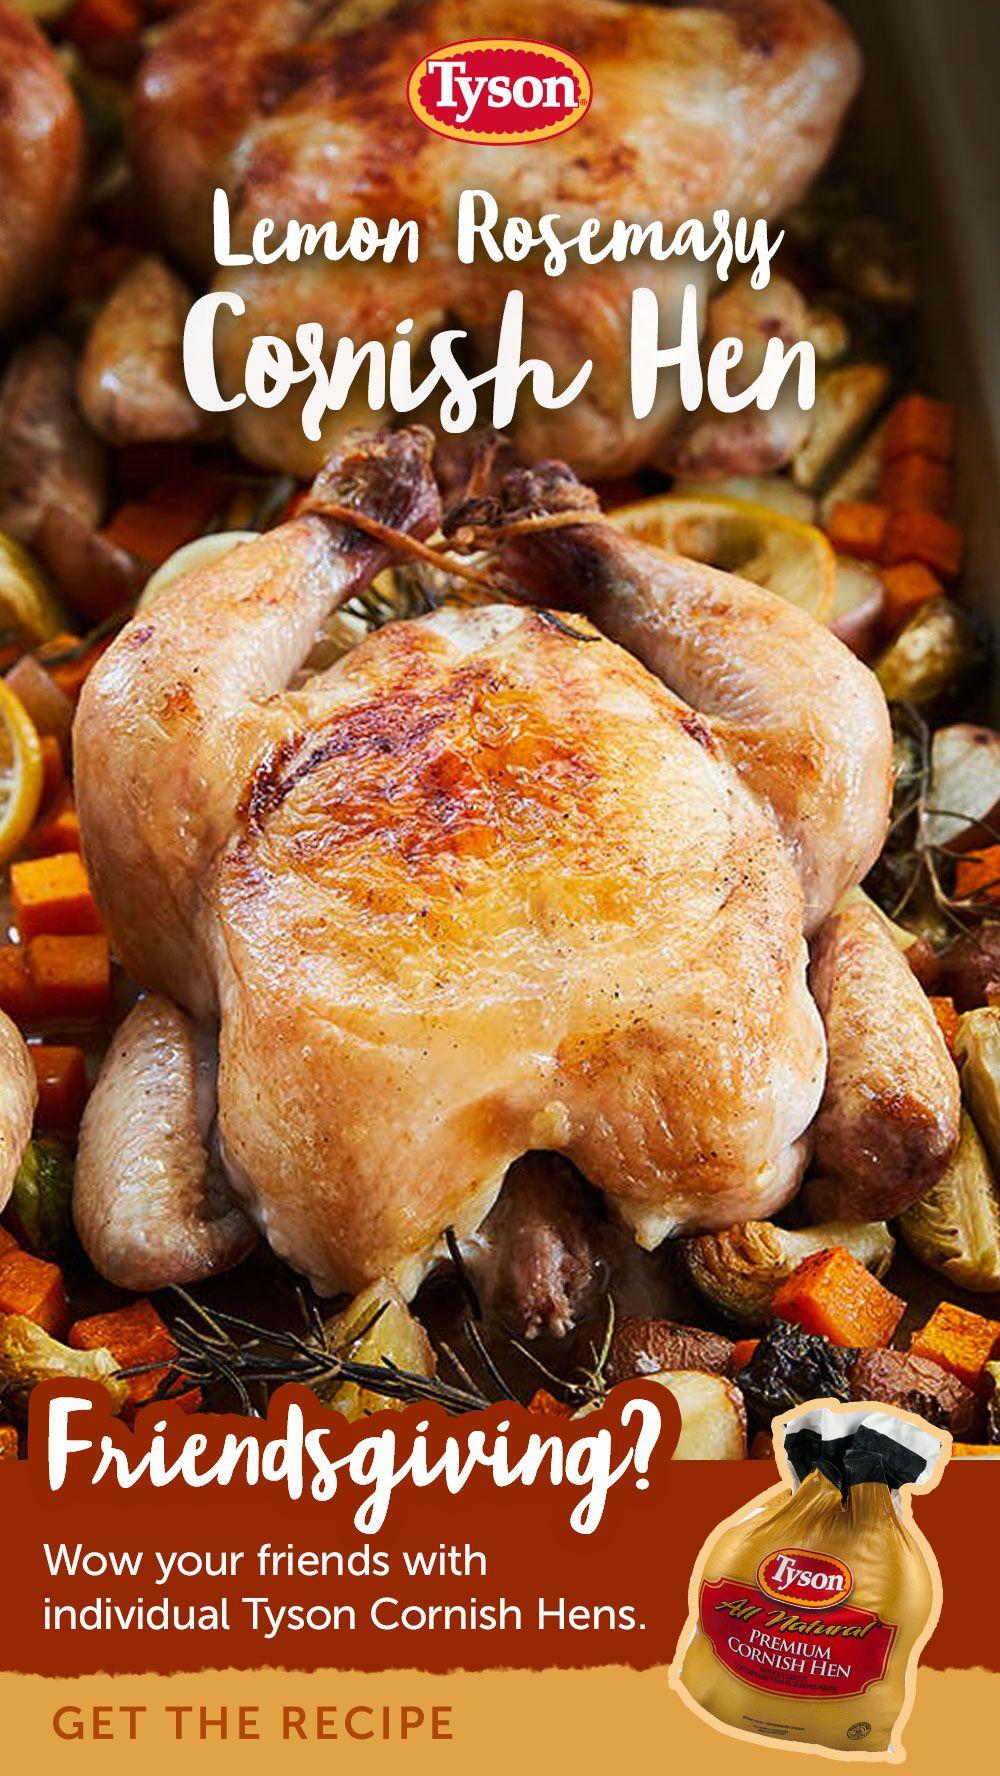 Rosemary-Glazed Cornish Hens